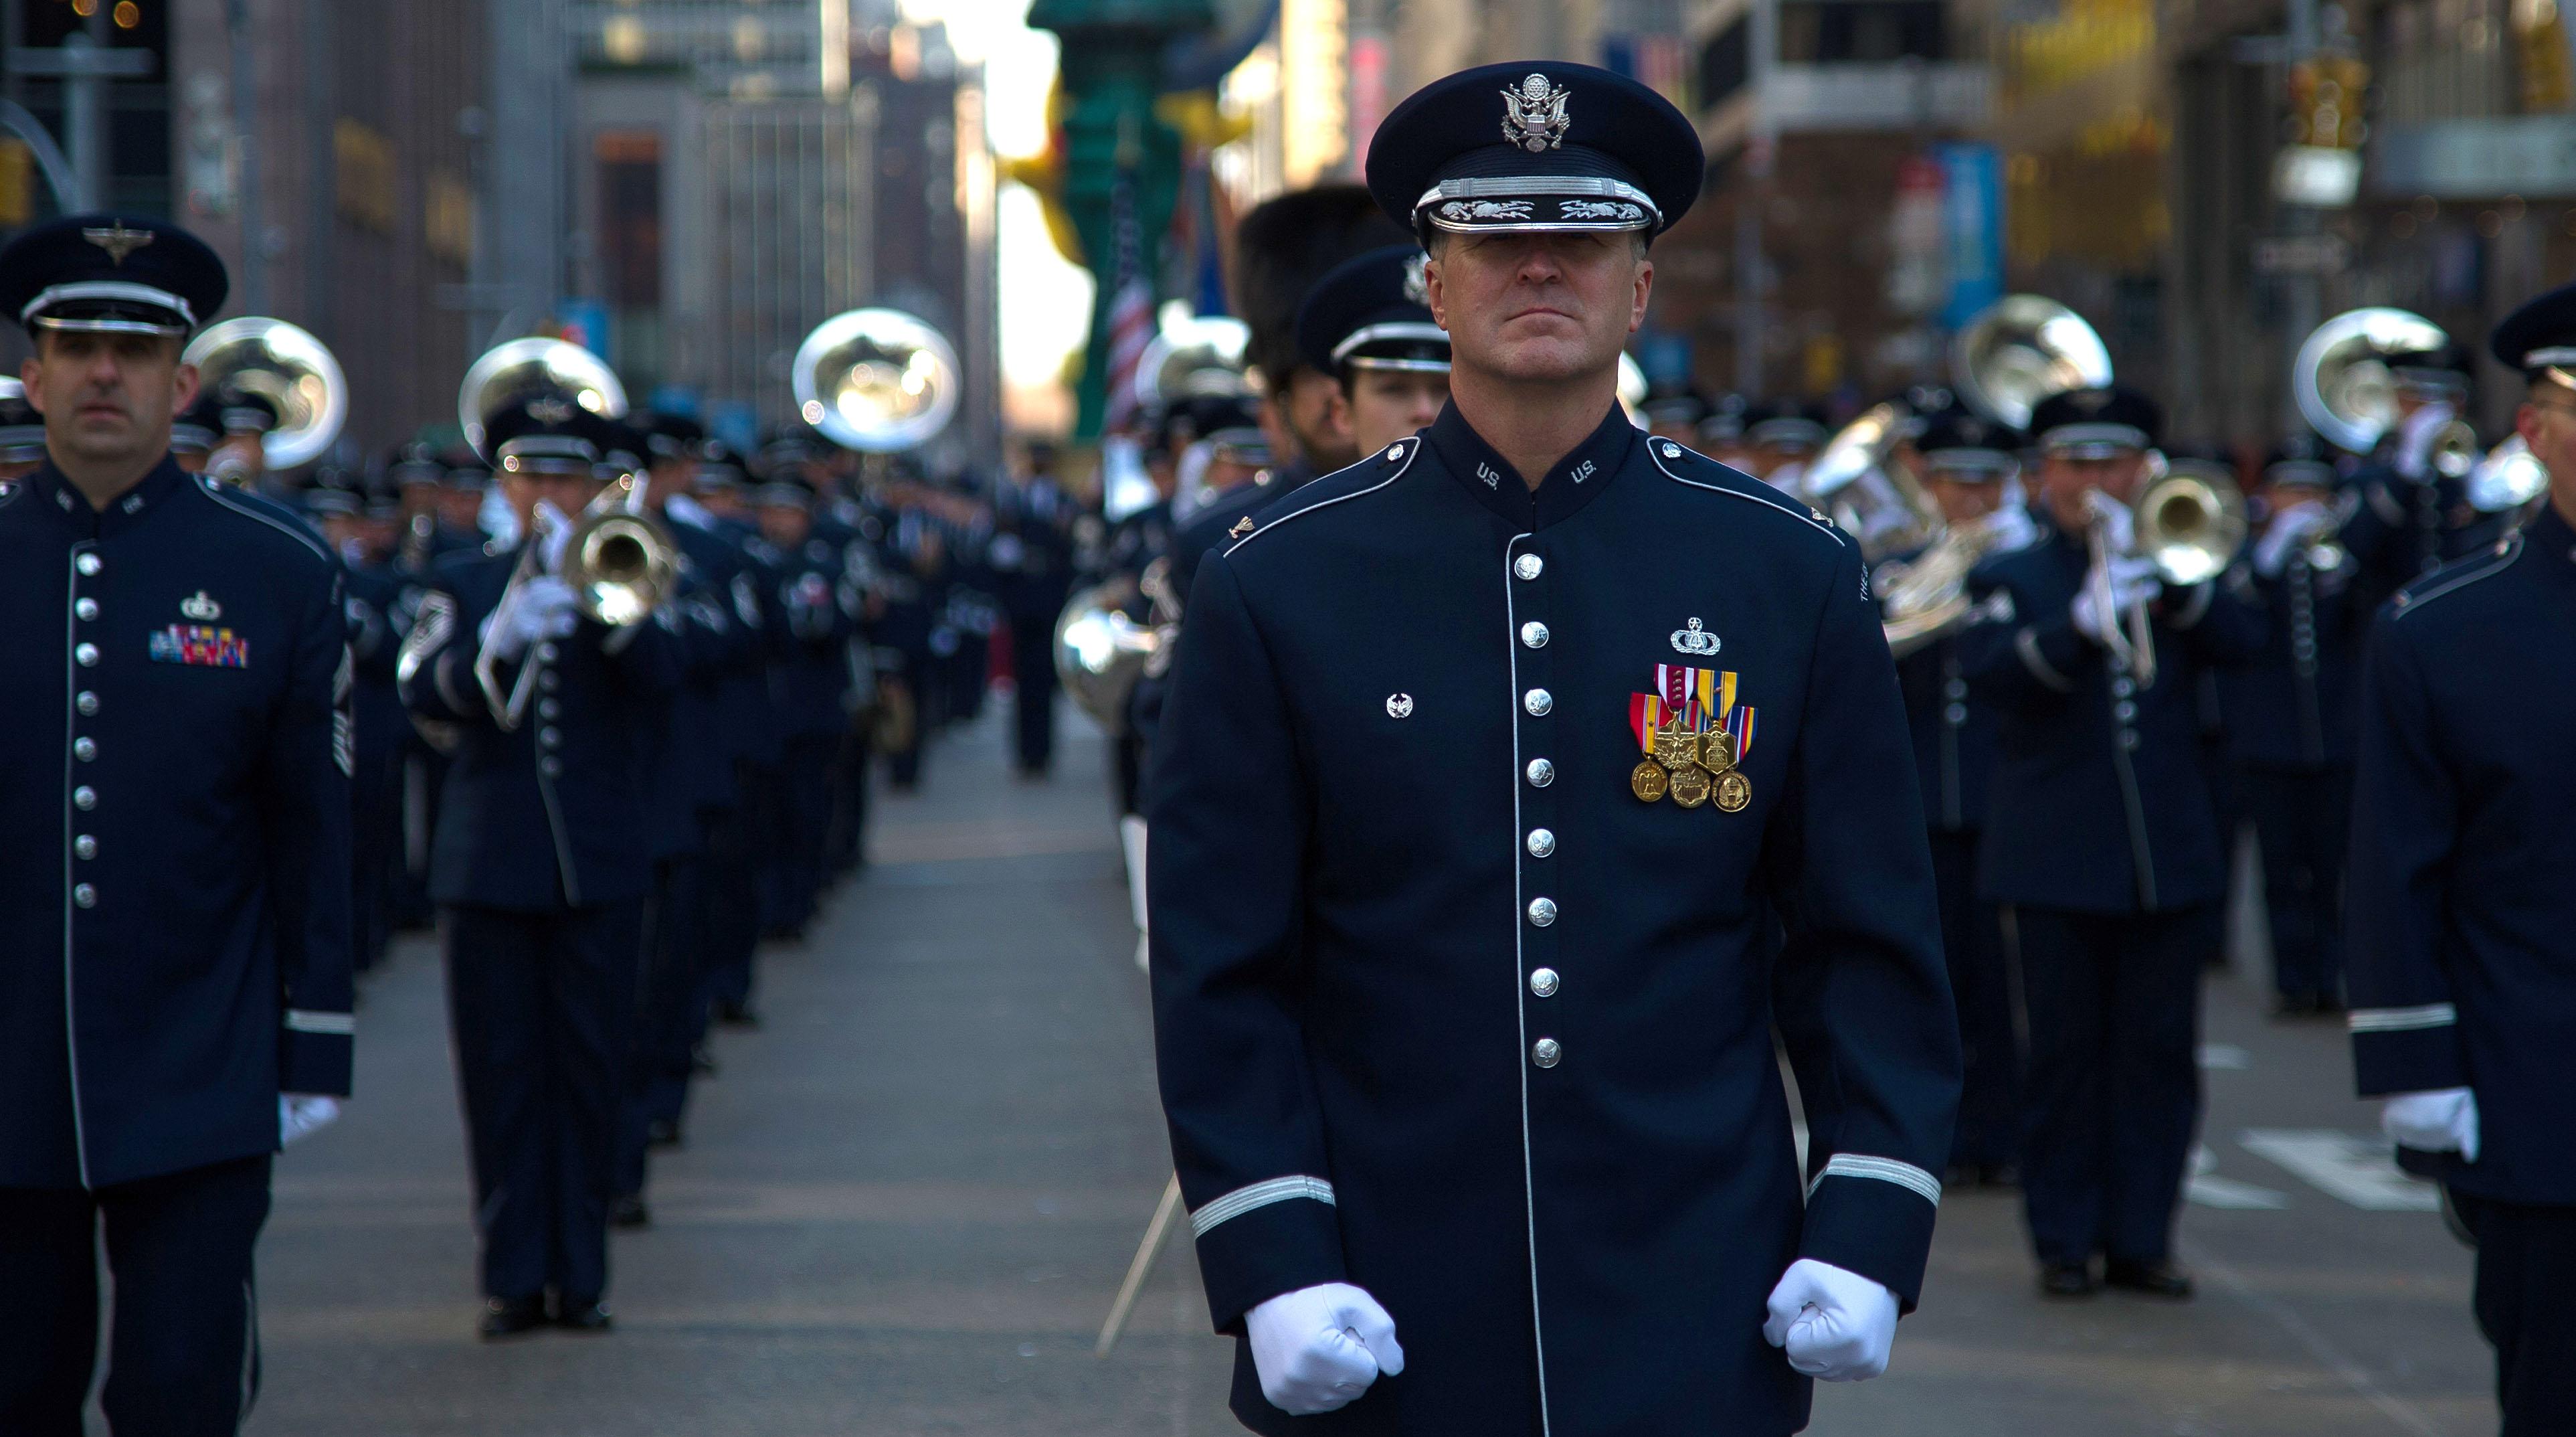 The USAF Band Macy's Parade